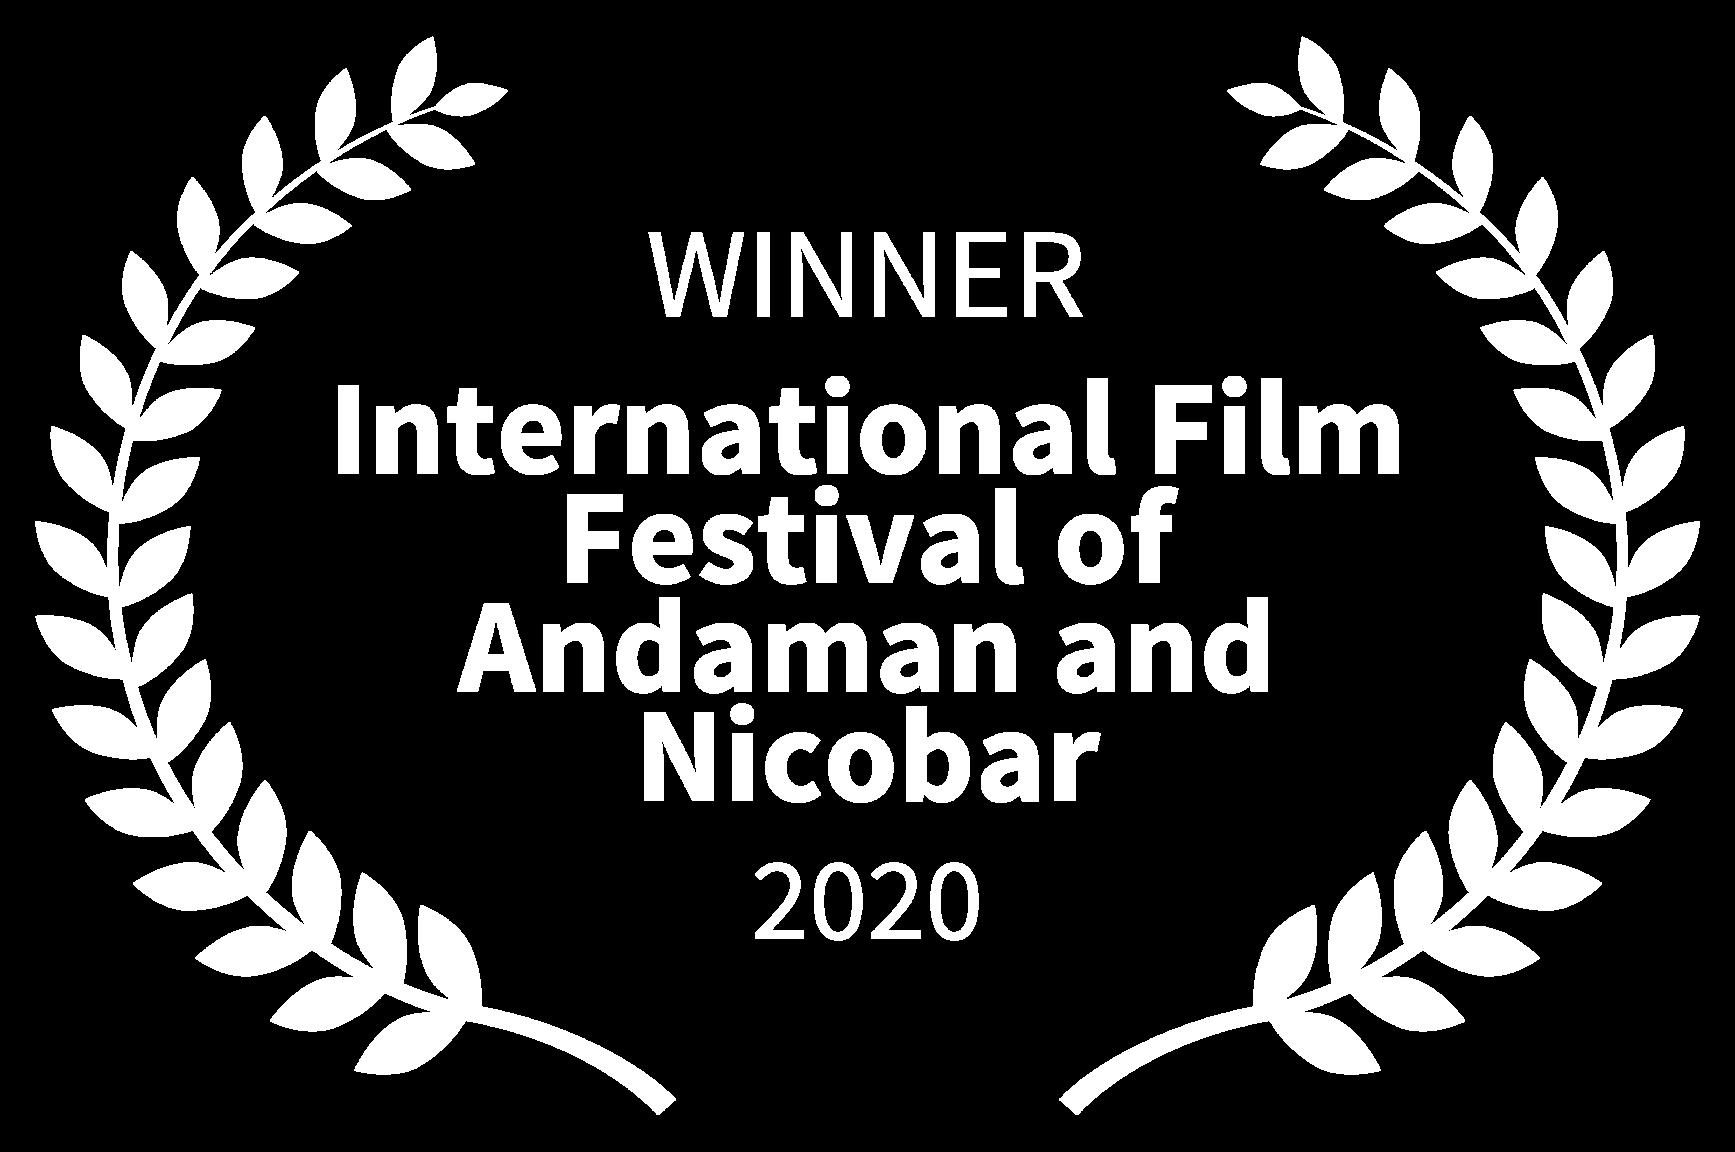 WINNER - International Film Festival of Andaman and Nicobar - 2020-1